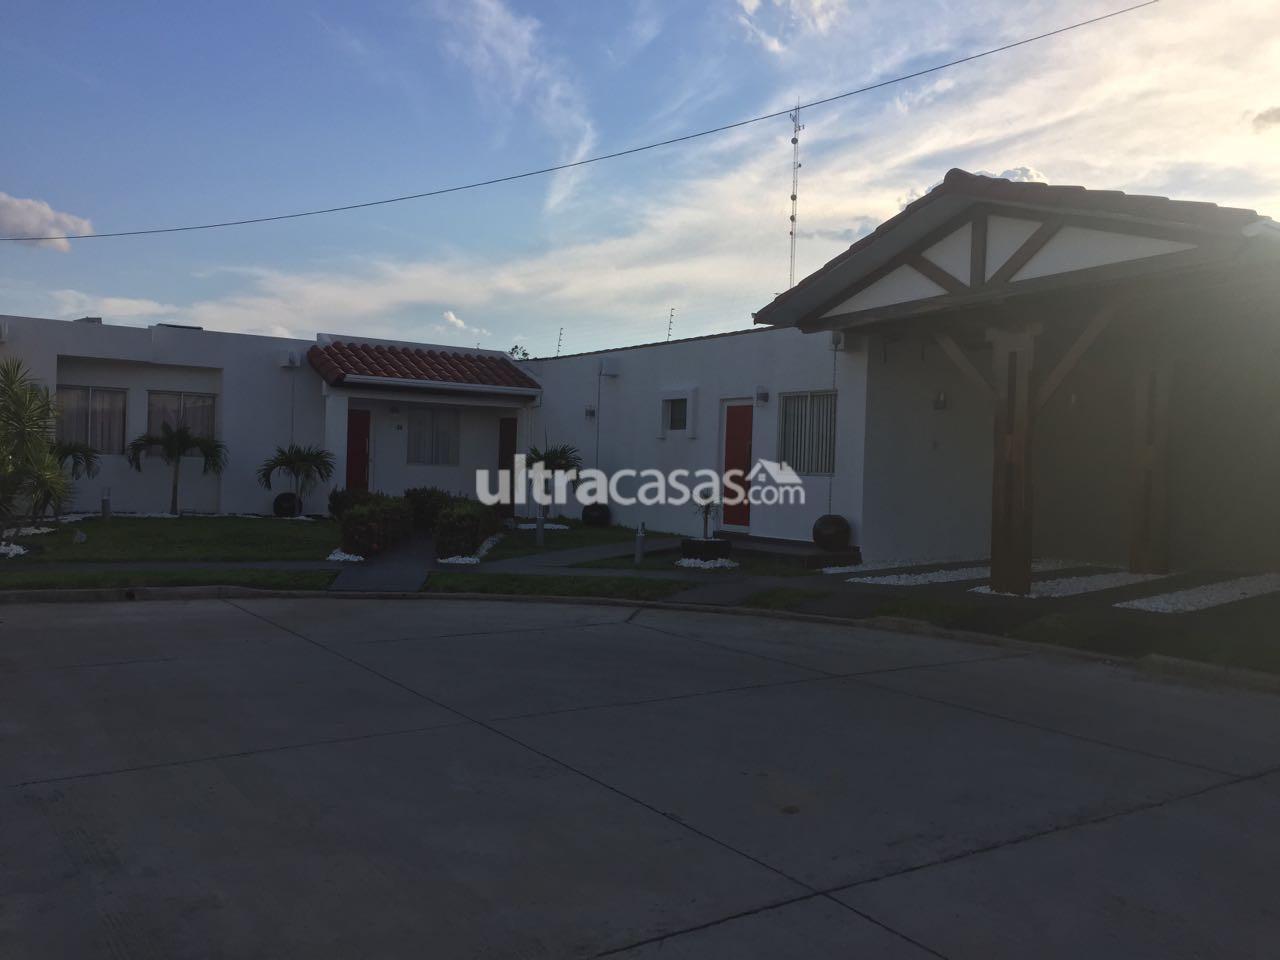 Casa en Venta Av. Banzer km, 10, condominio Sevilla Las Terazas I, calle San Pedro Oeste 24. Foto 19